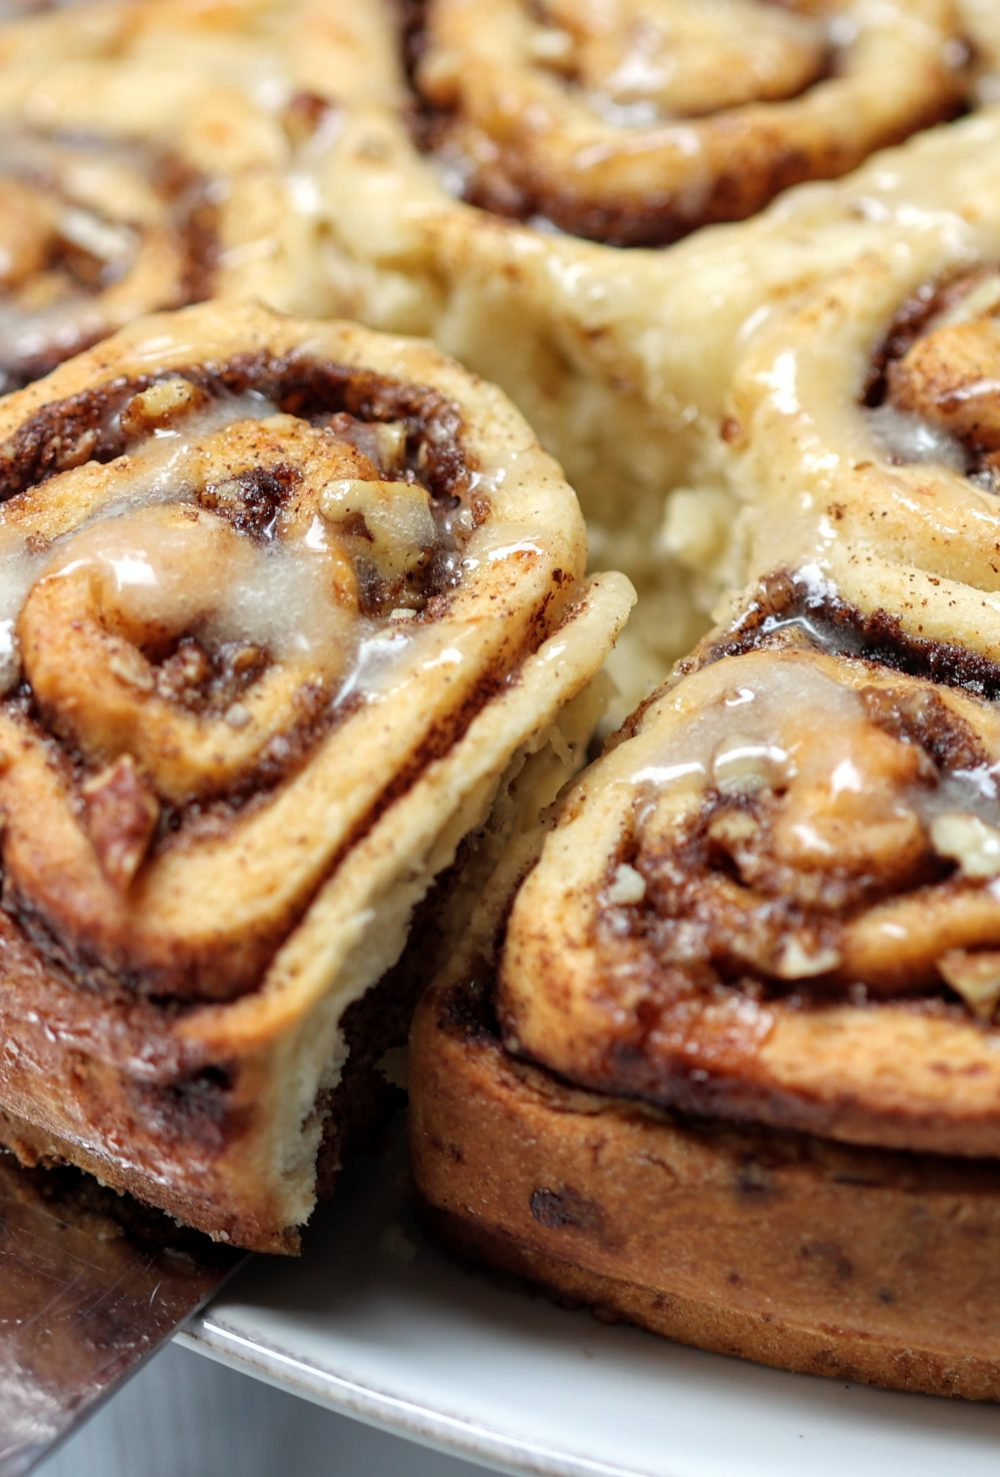 Easy No-Yeast Cinnamon Buns